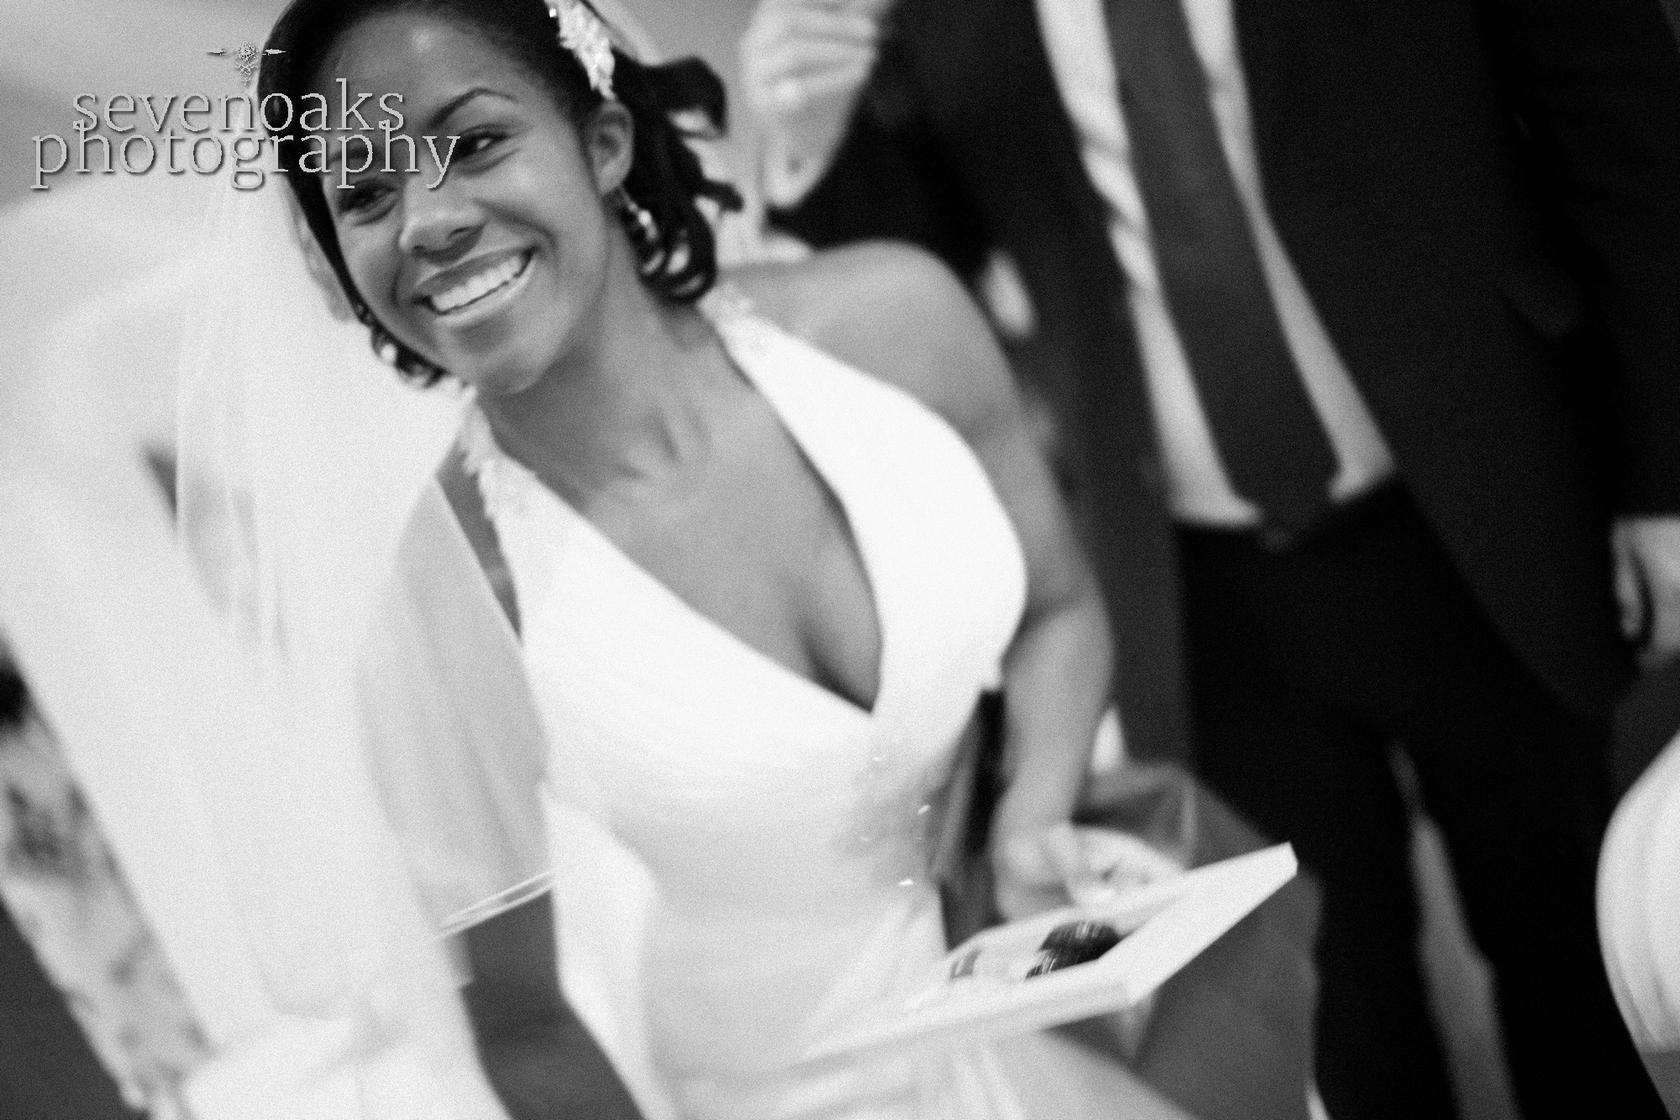 Sevenoaks documentary wedding photographer-13.jpg